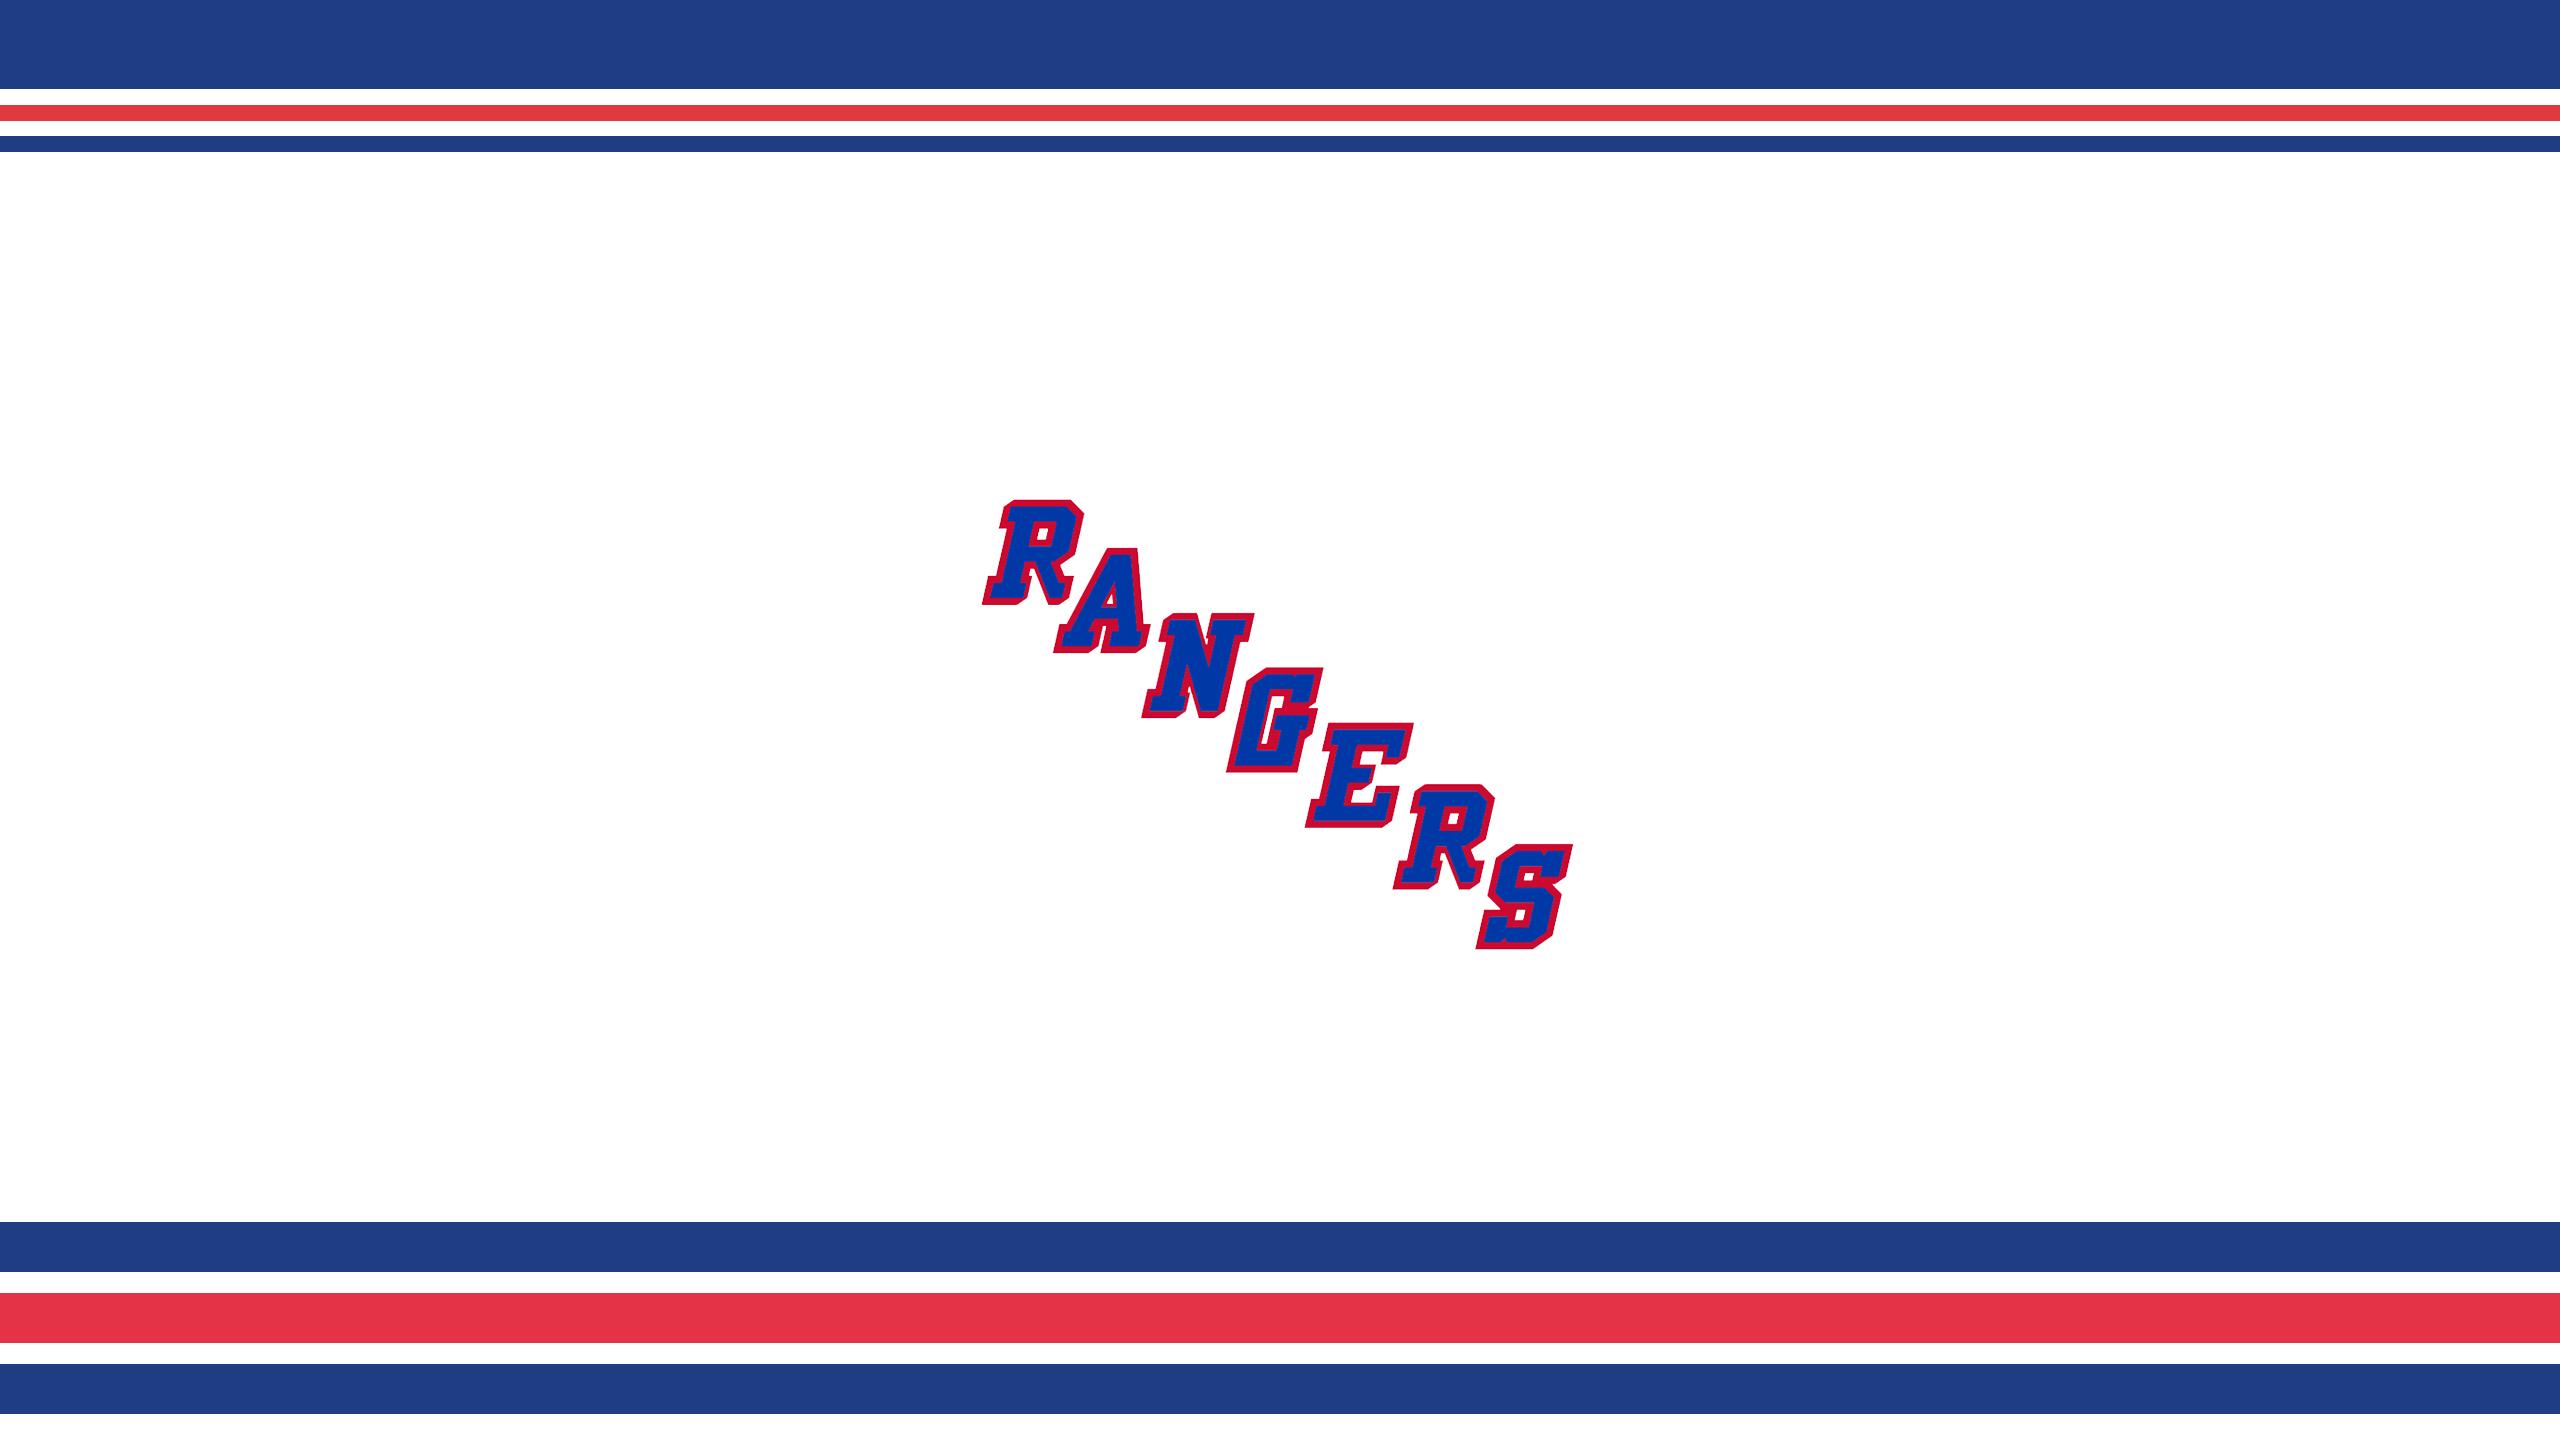 New York Rangers (Away)